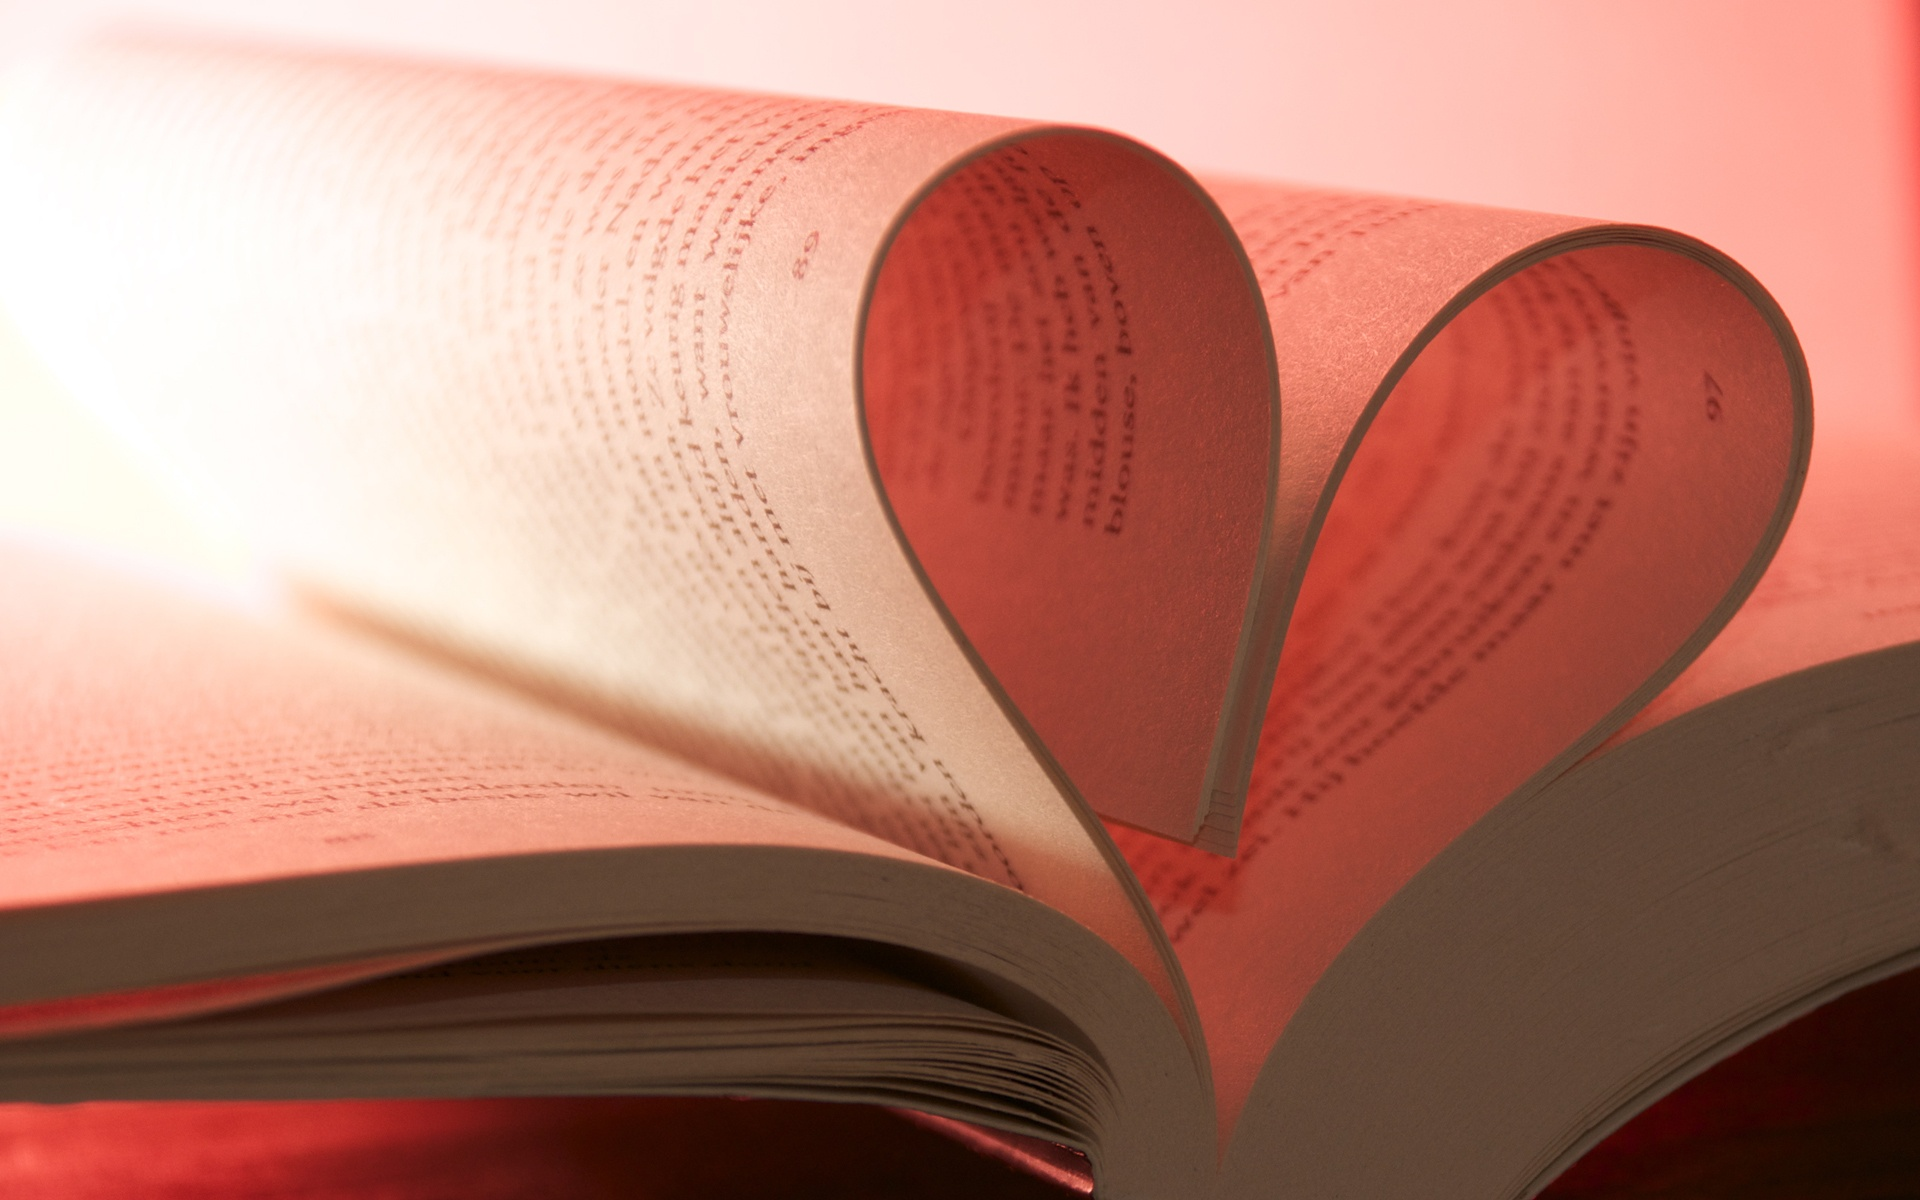 Book of love wallpaper   wallpapers download wallpaper desktop 1920x1200